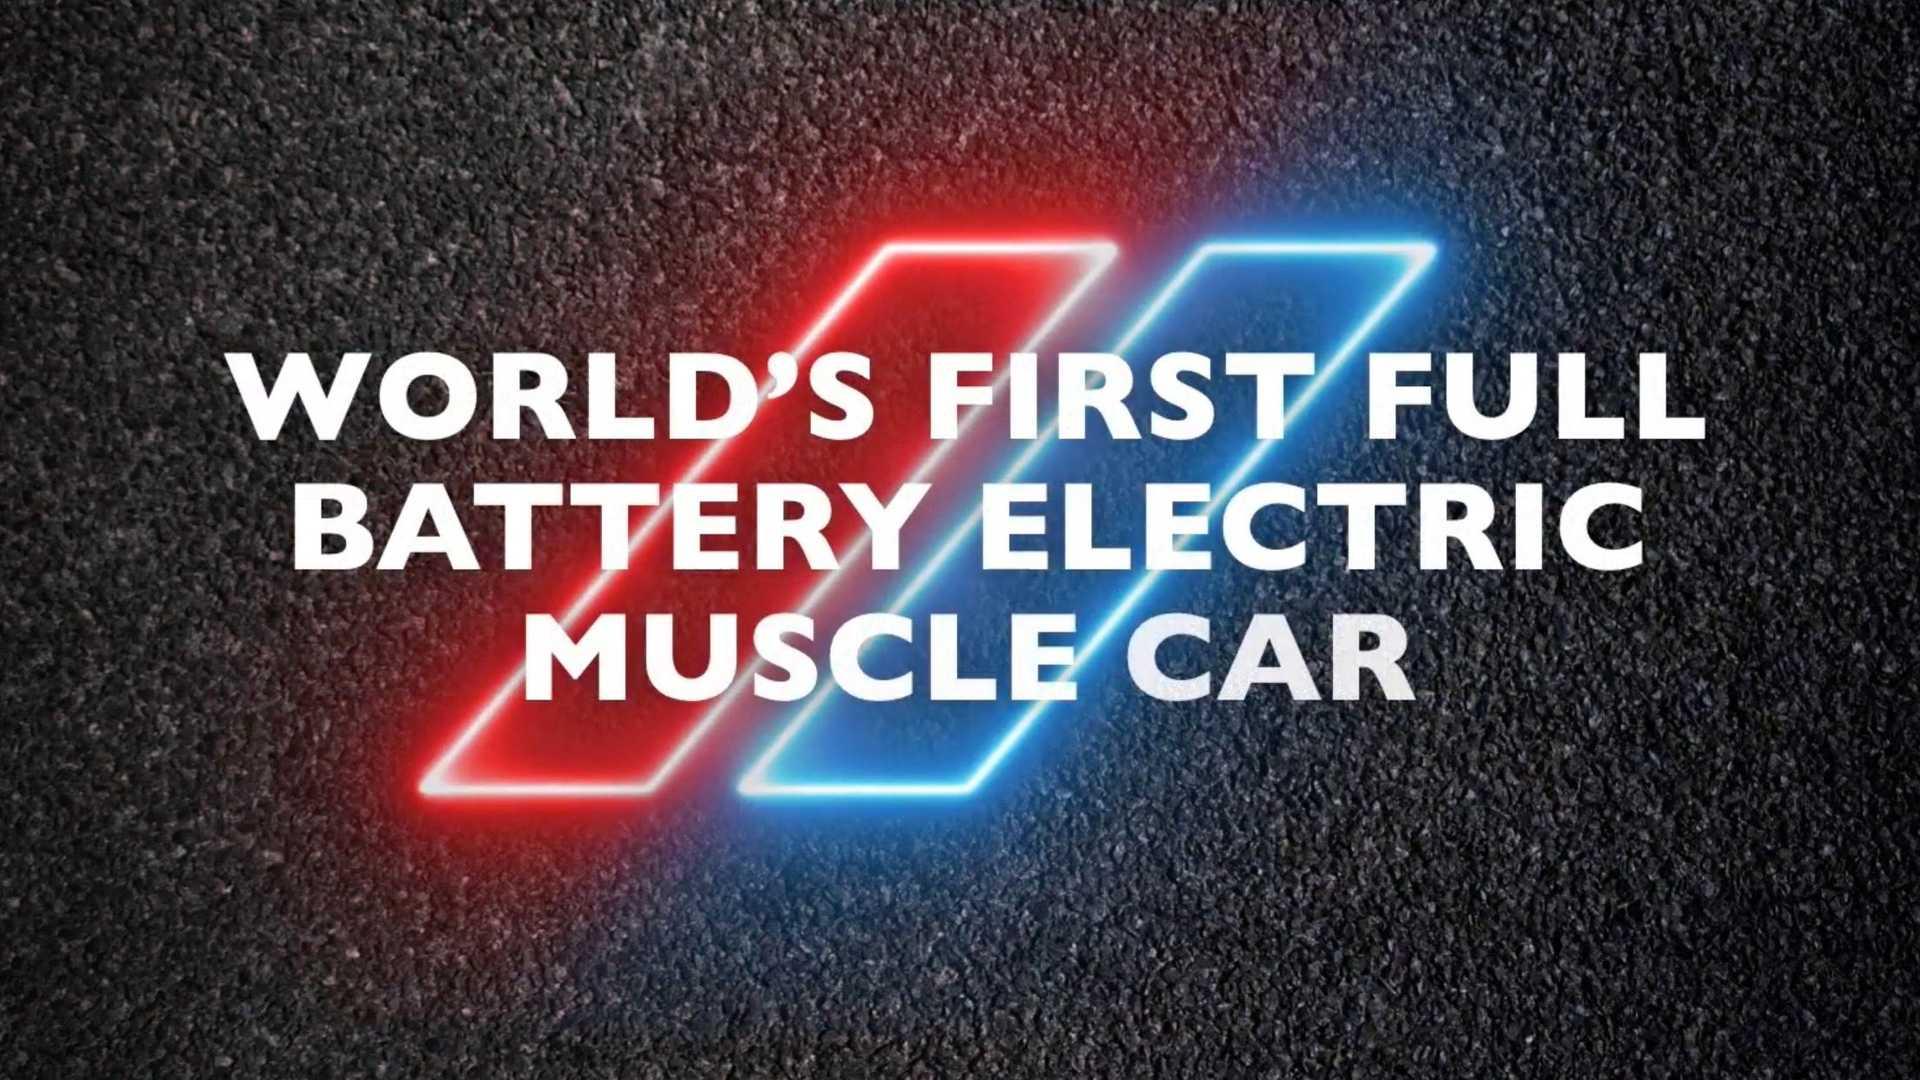 dodge-electric-muscle-car-teaser-claim